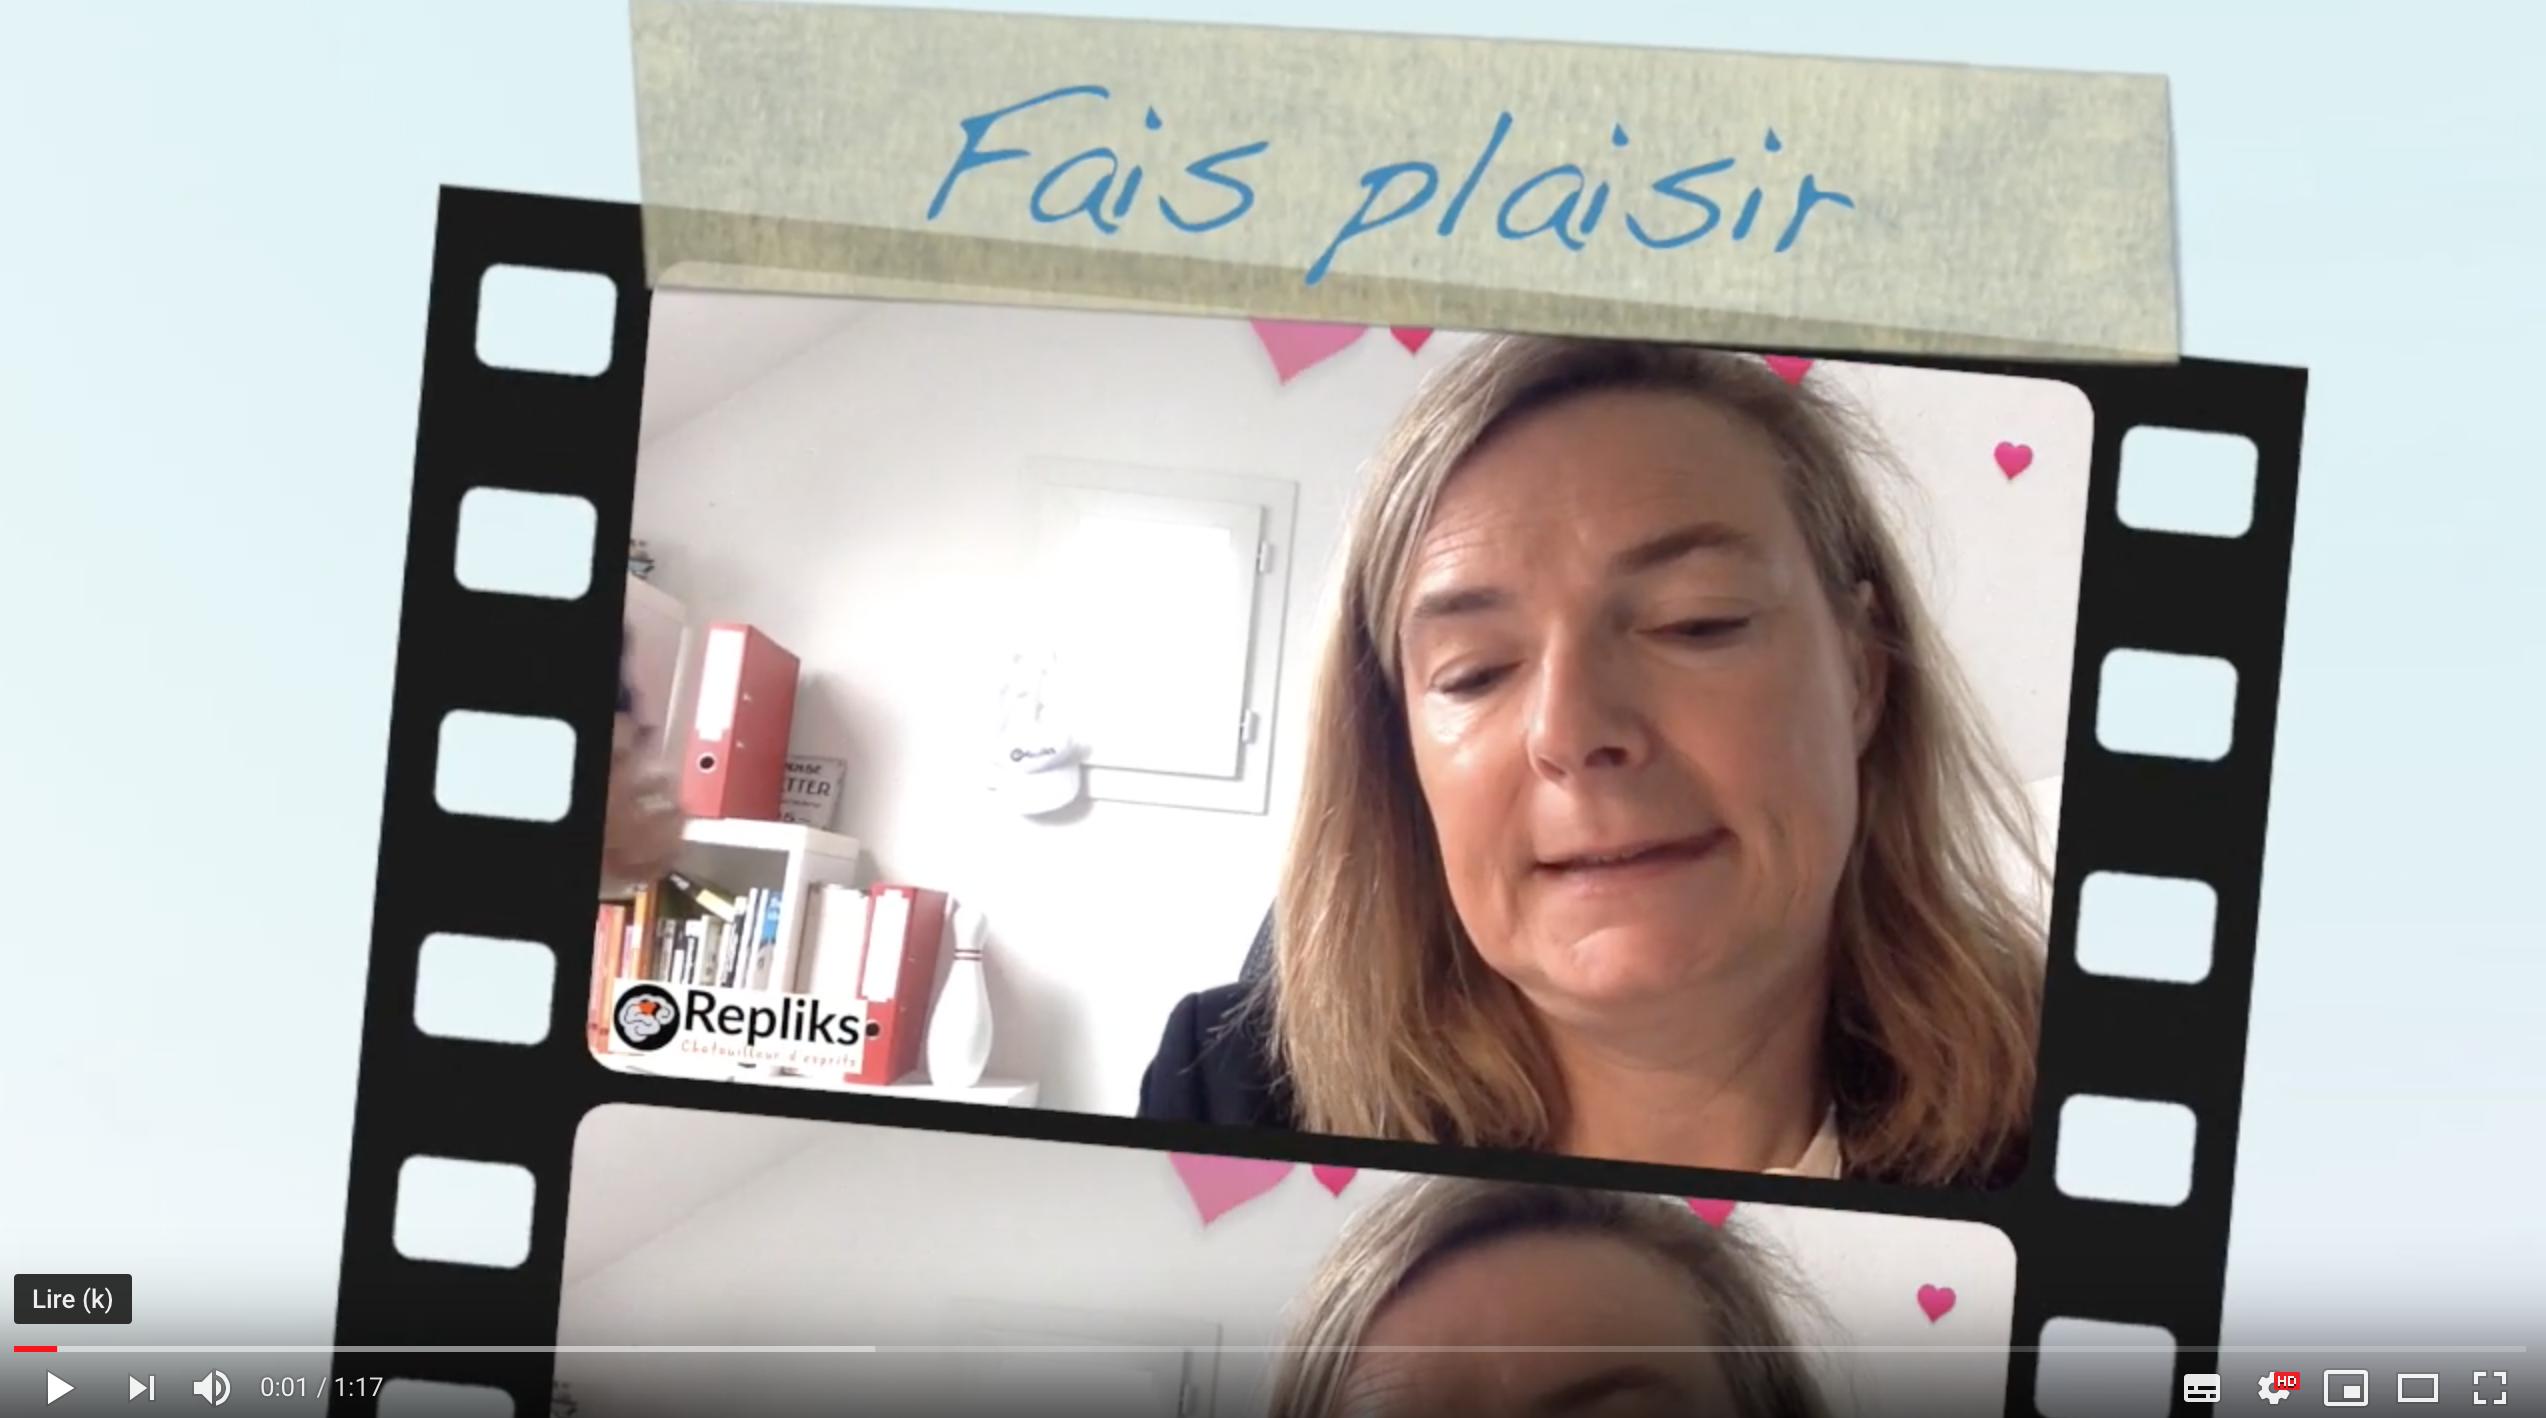 Fais plaisir !! by Repliks